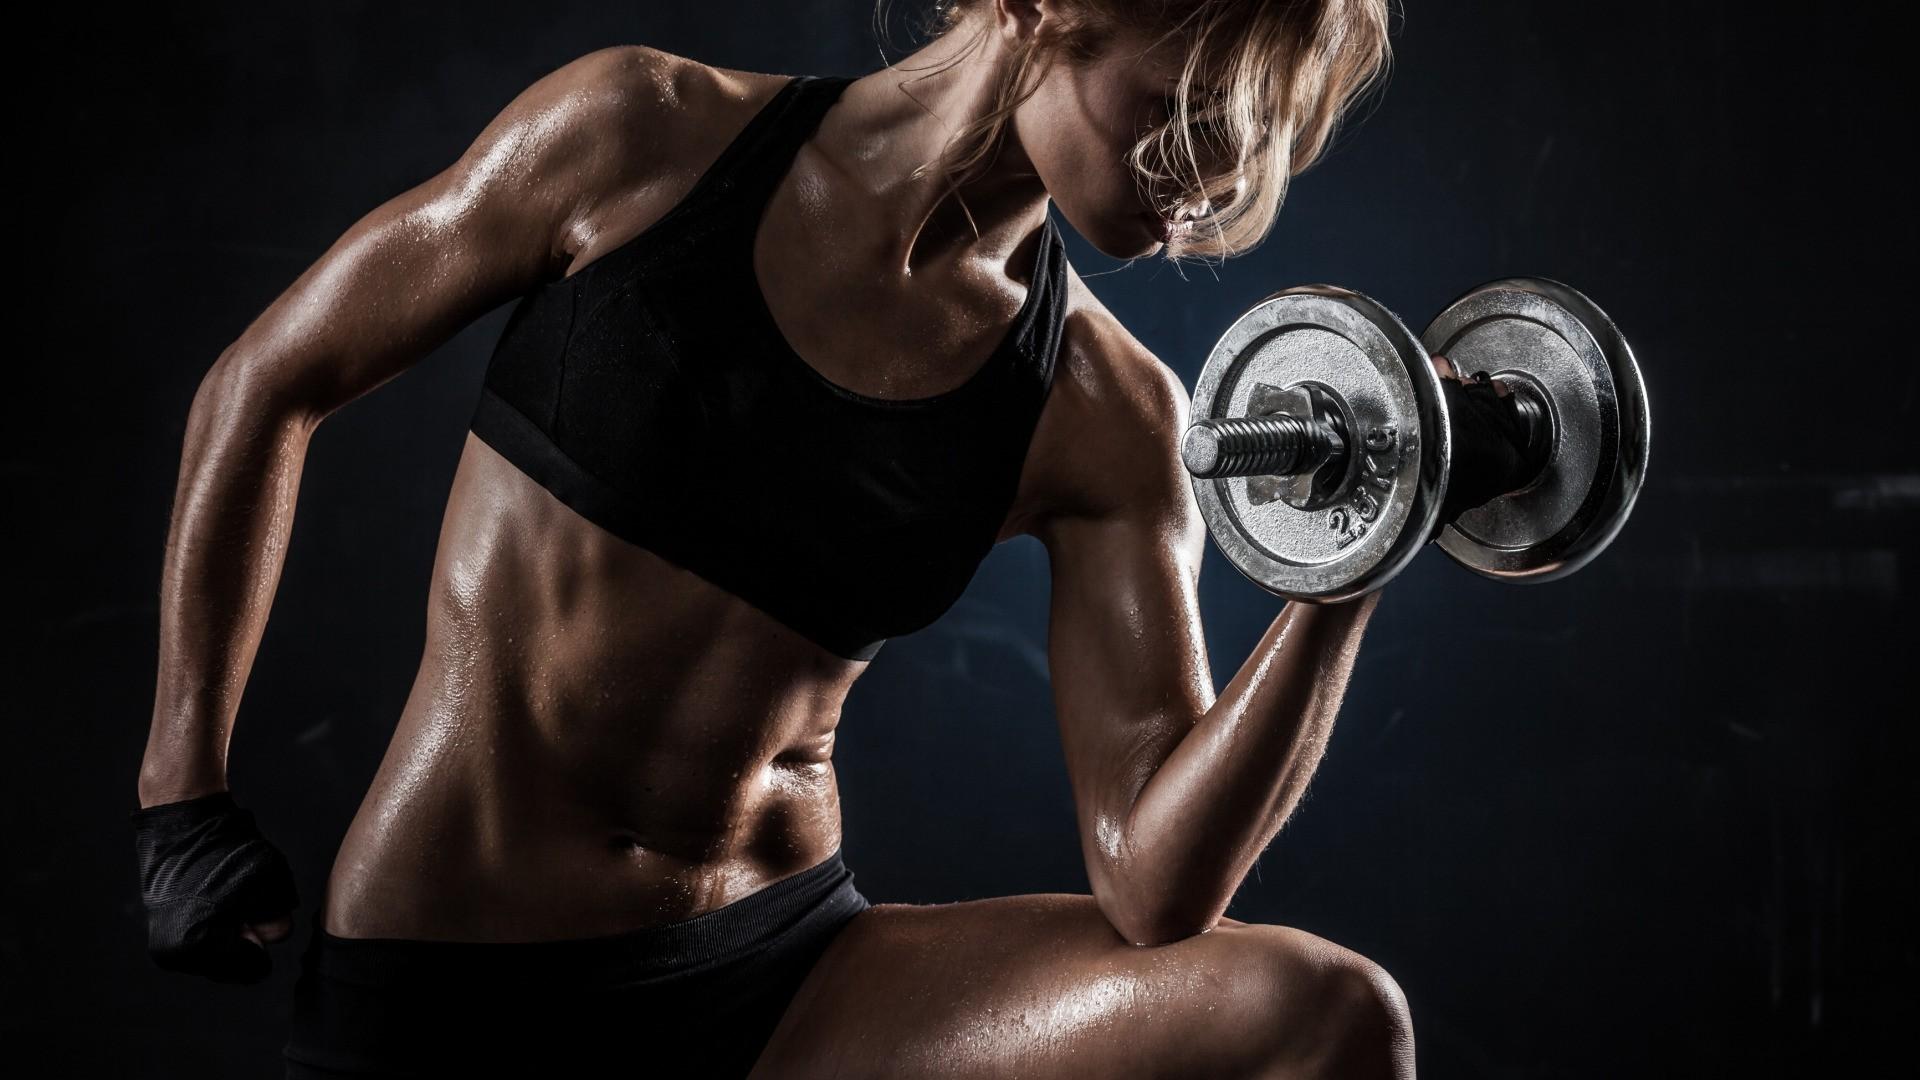 Fitness HD Wallpaper